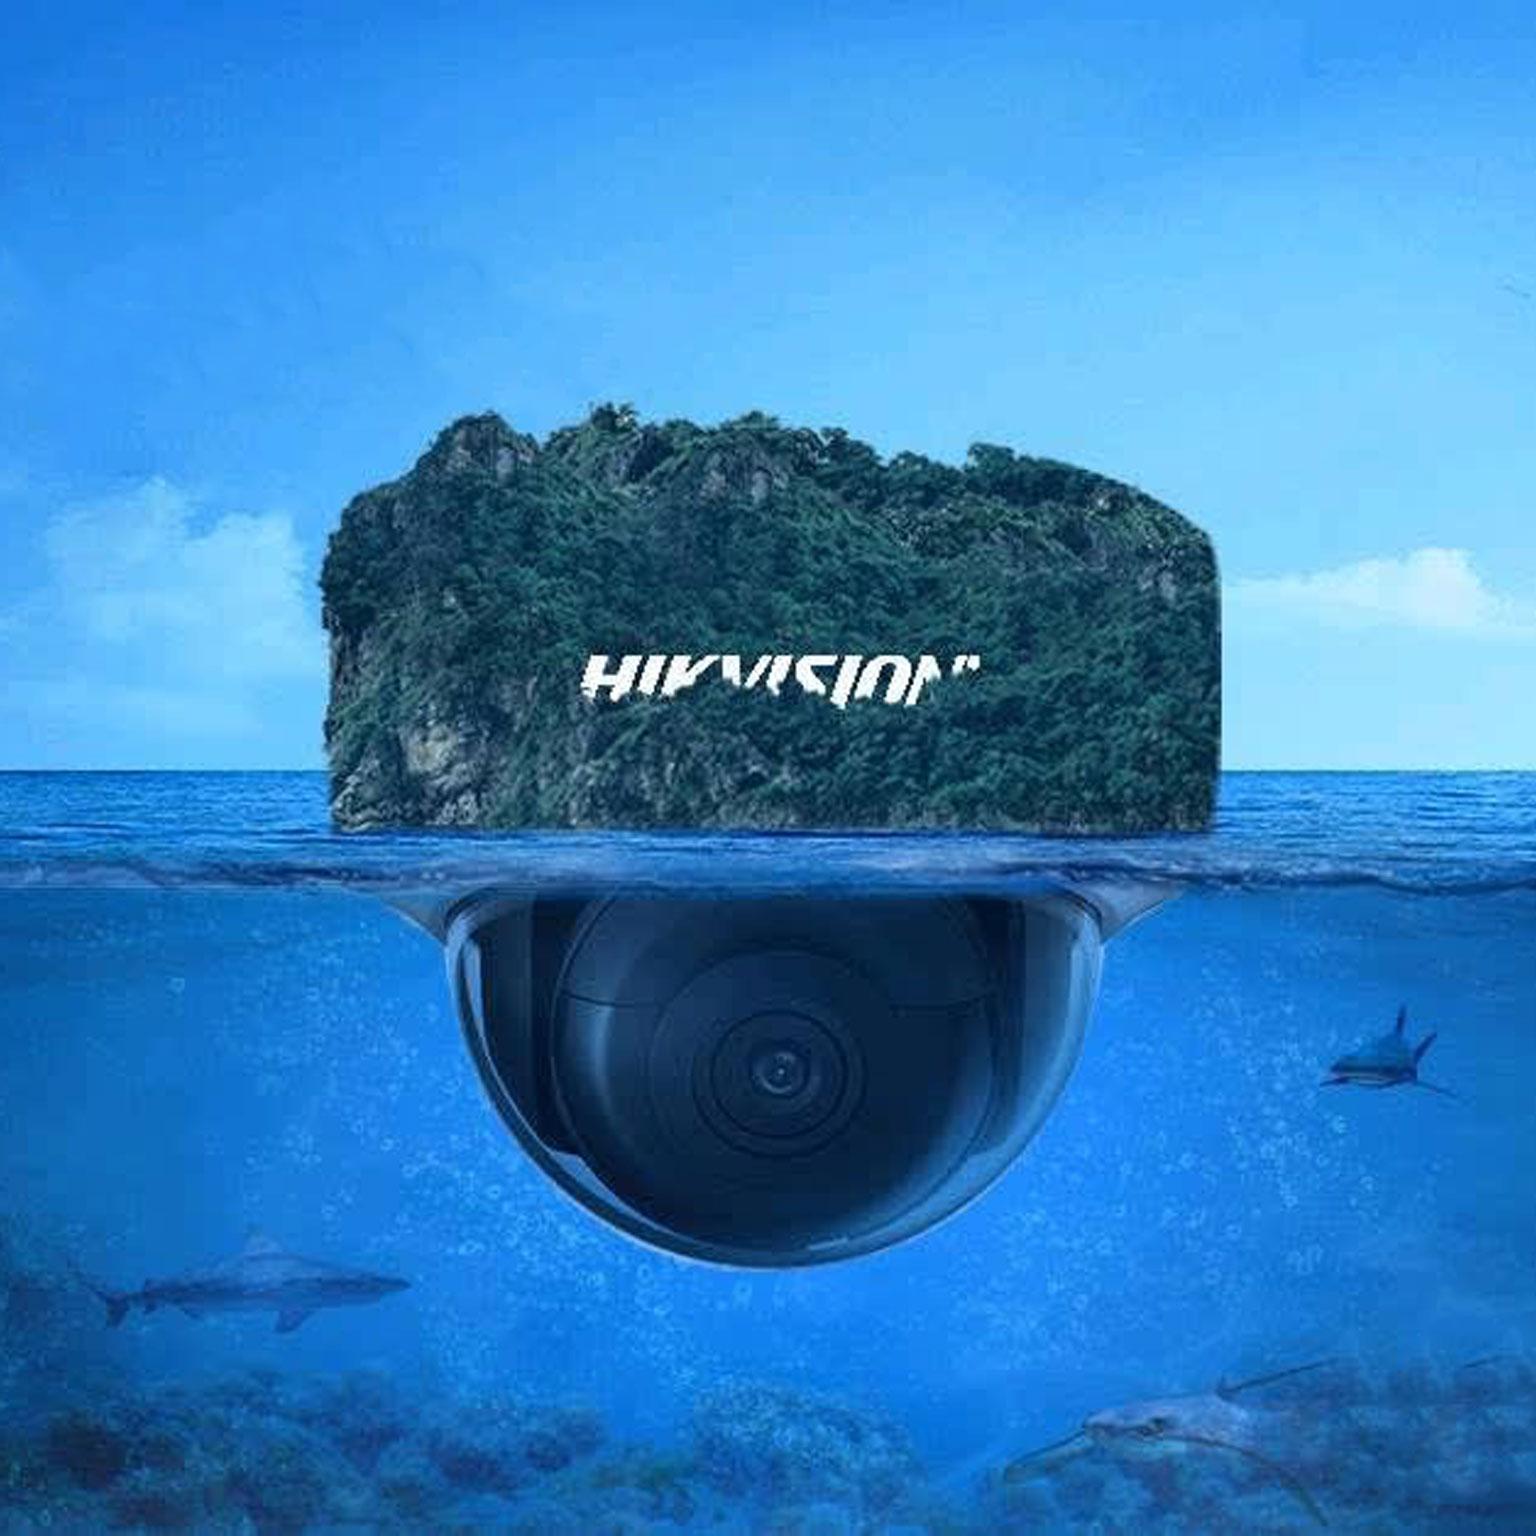 Hikvision camerasysteem Hikvision HD camera Jablotron 100 alarmsysteem beveiligingssystemen toegangscontrole intercomsysteem video deurbel video intercom